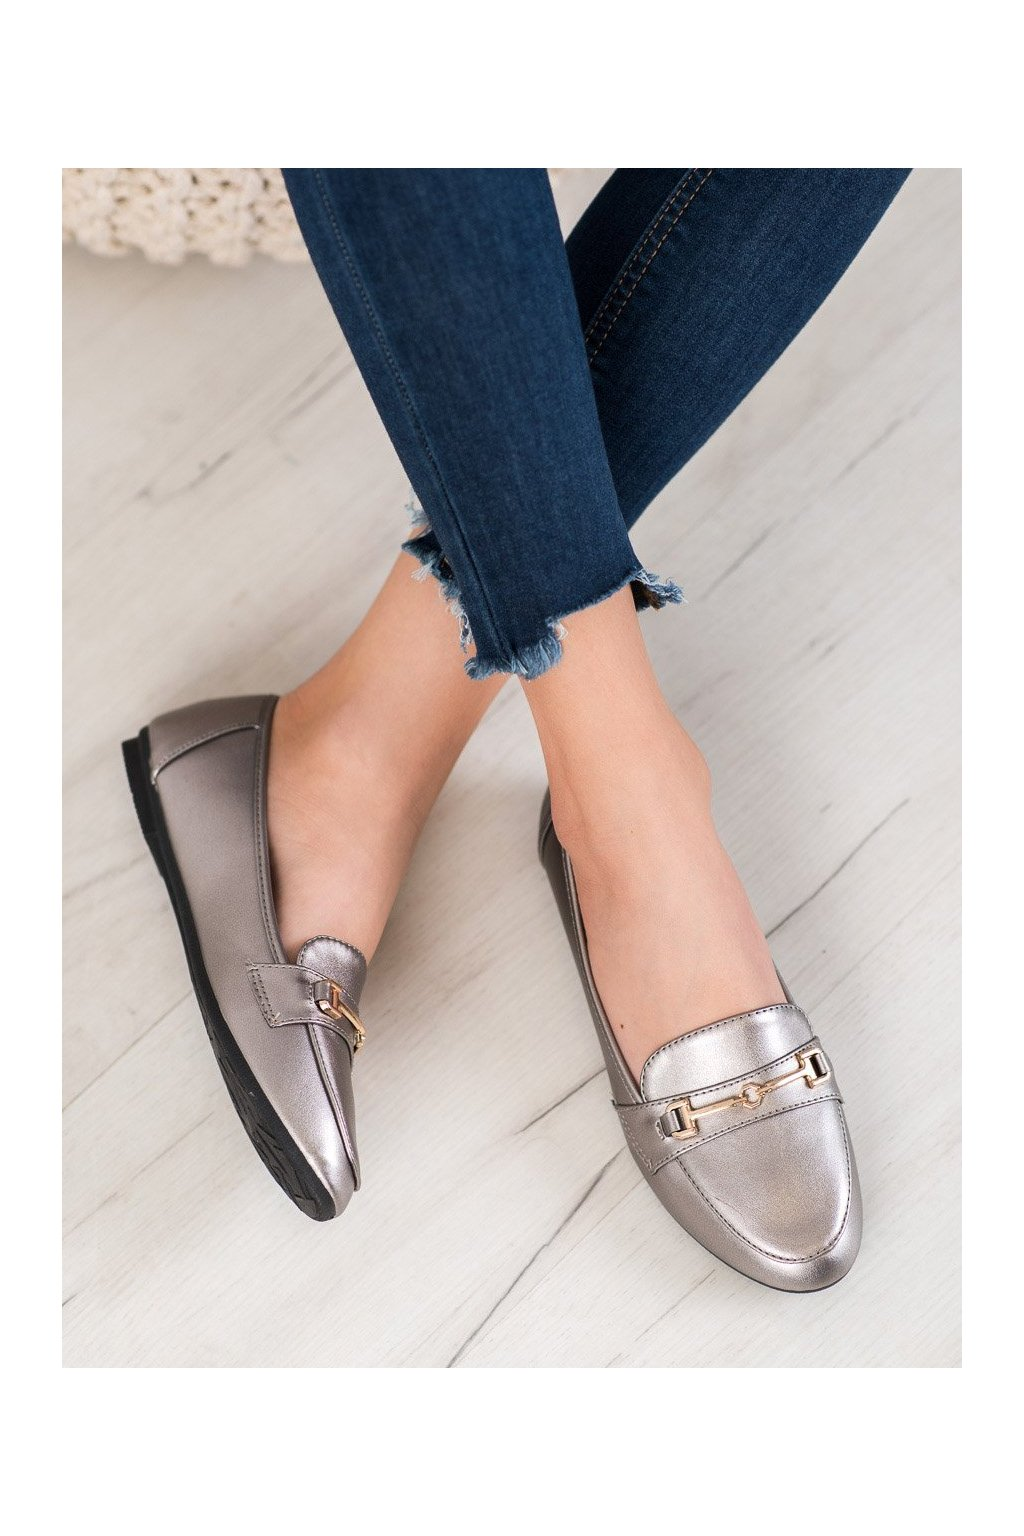 Sivé topánky Clowse kod 9F176GUN